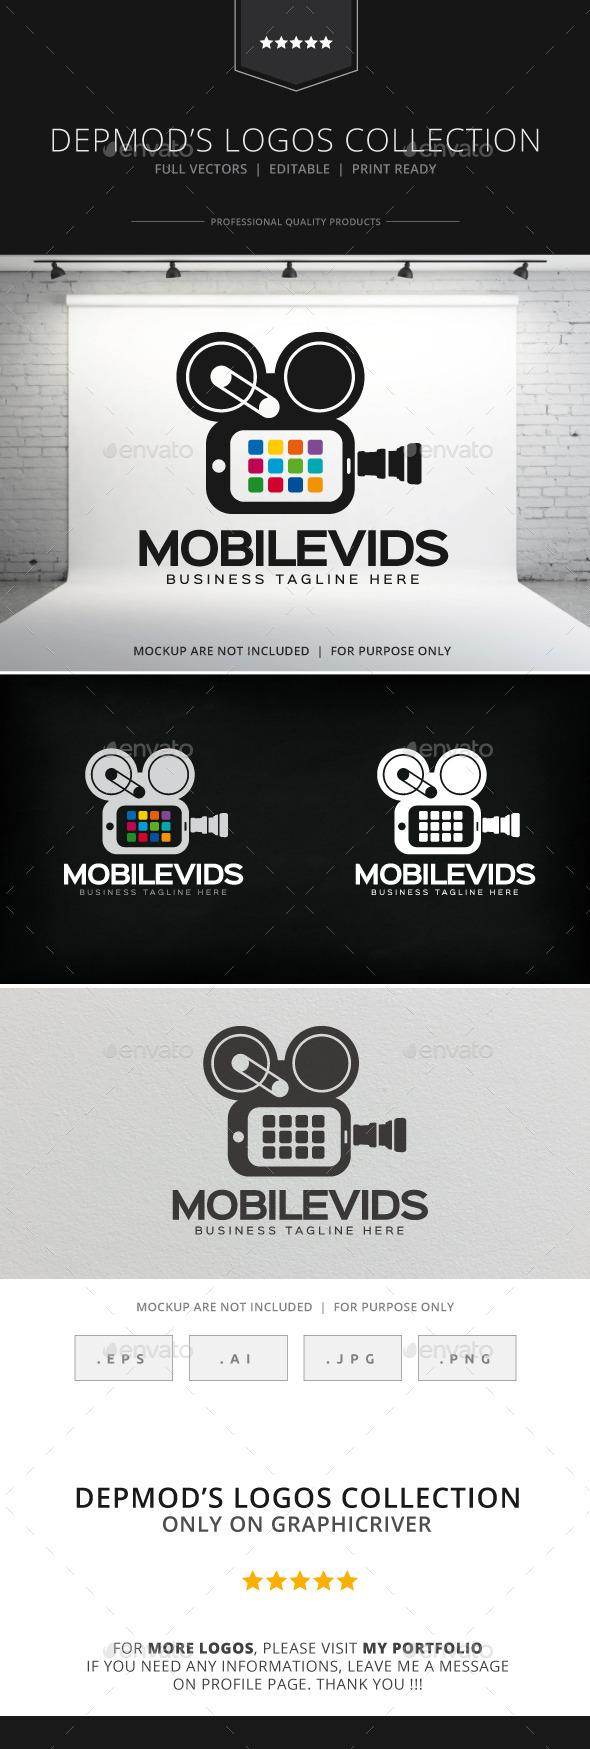 GraphicRiver Mobile Vids Logo 8923793